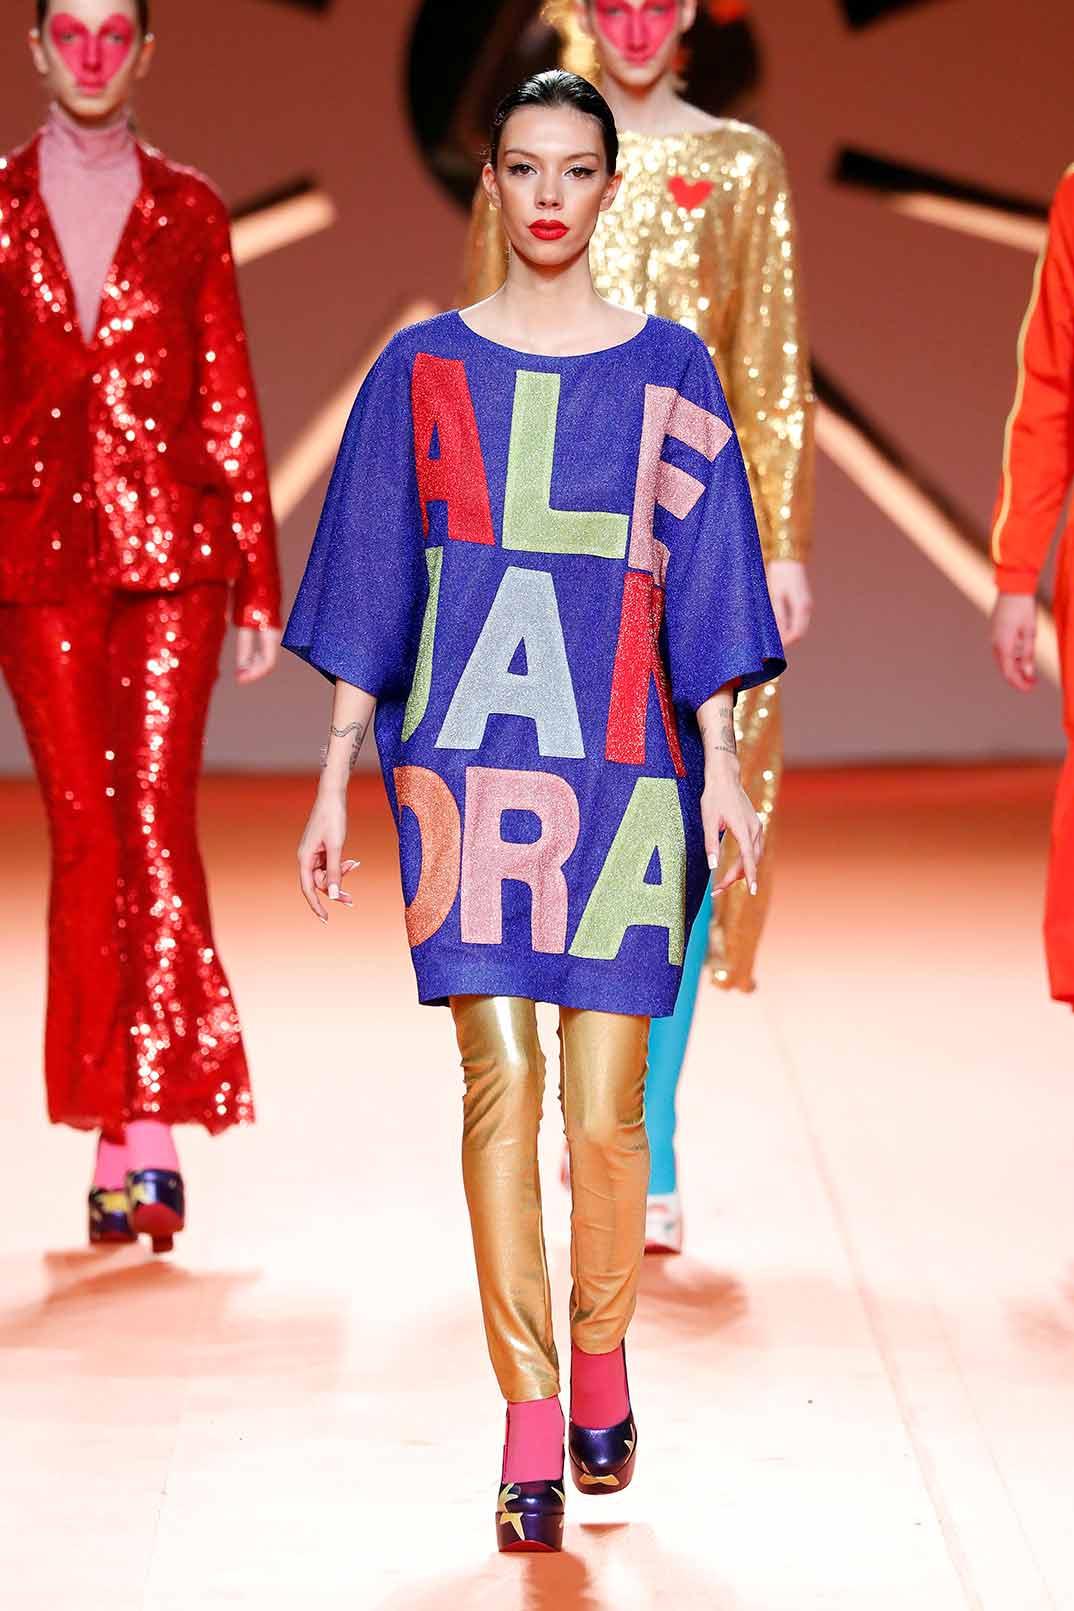 Alejandra Rubio - Agatha Ruiz de la Prada - Fashion Week Madrid Otoño-Invierno 2020-2021